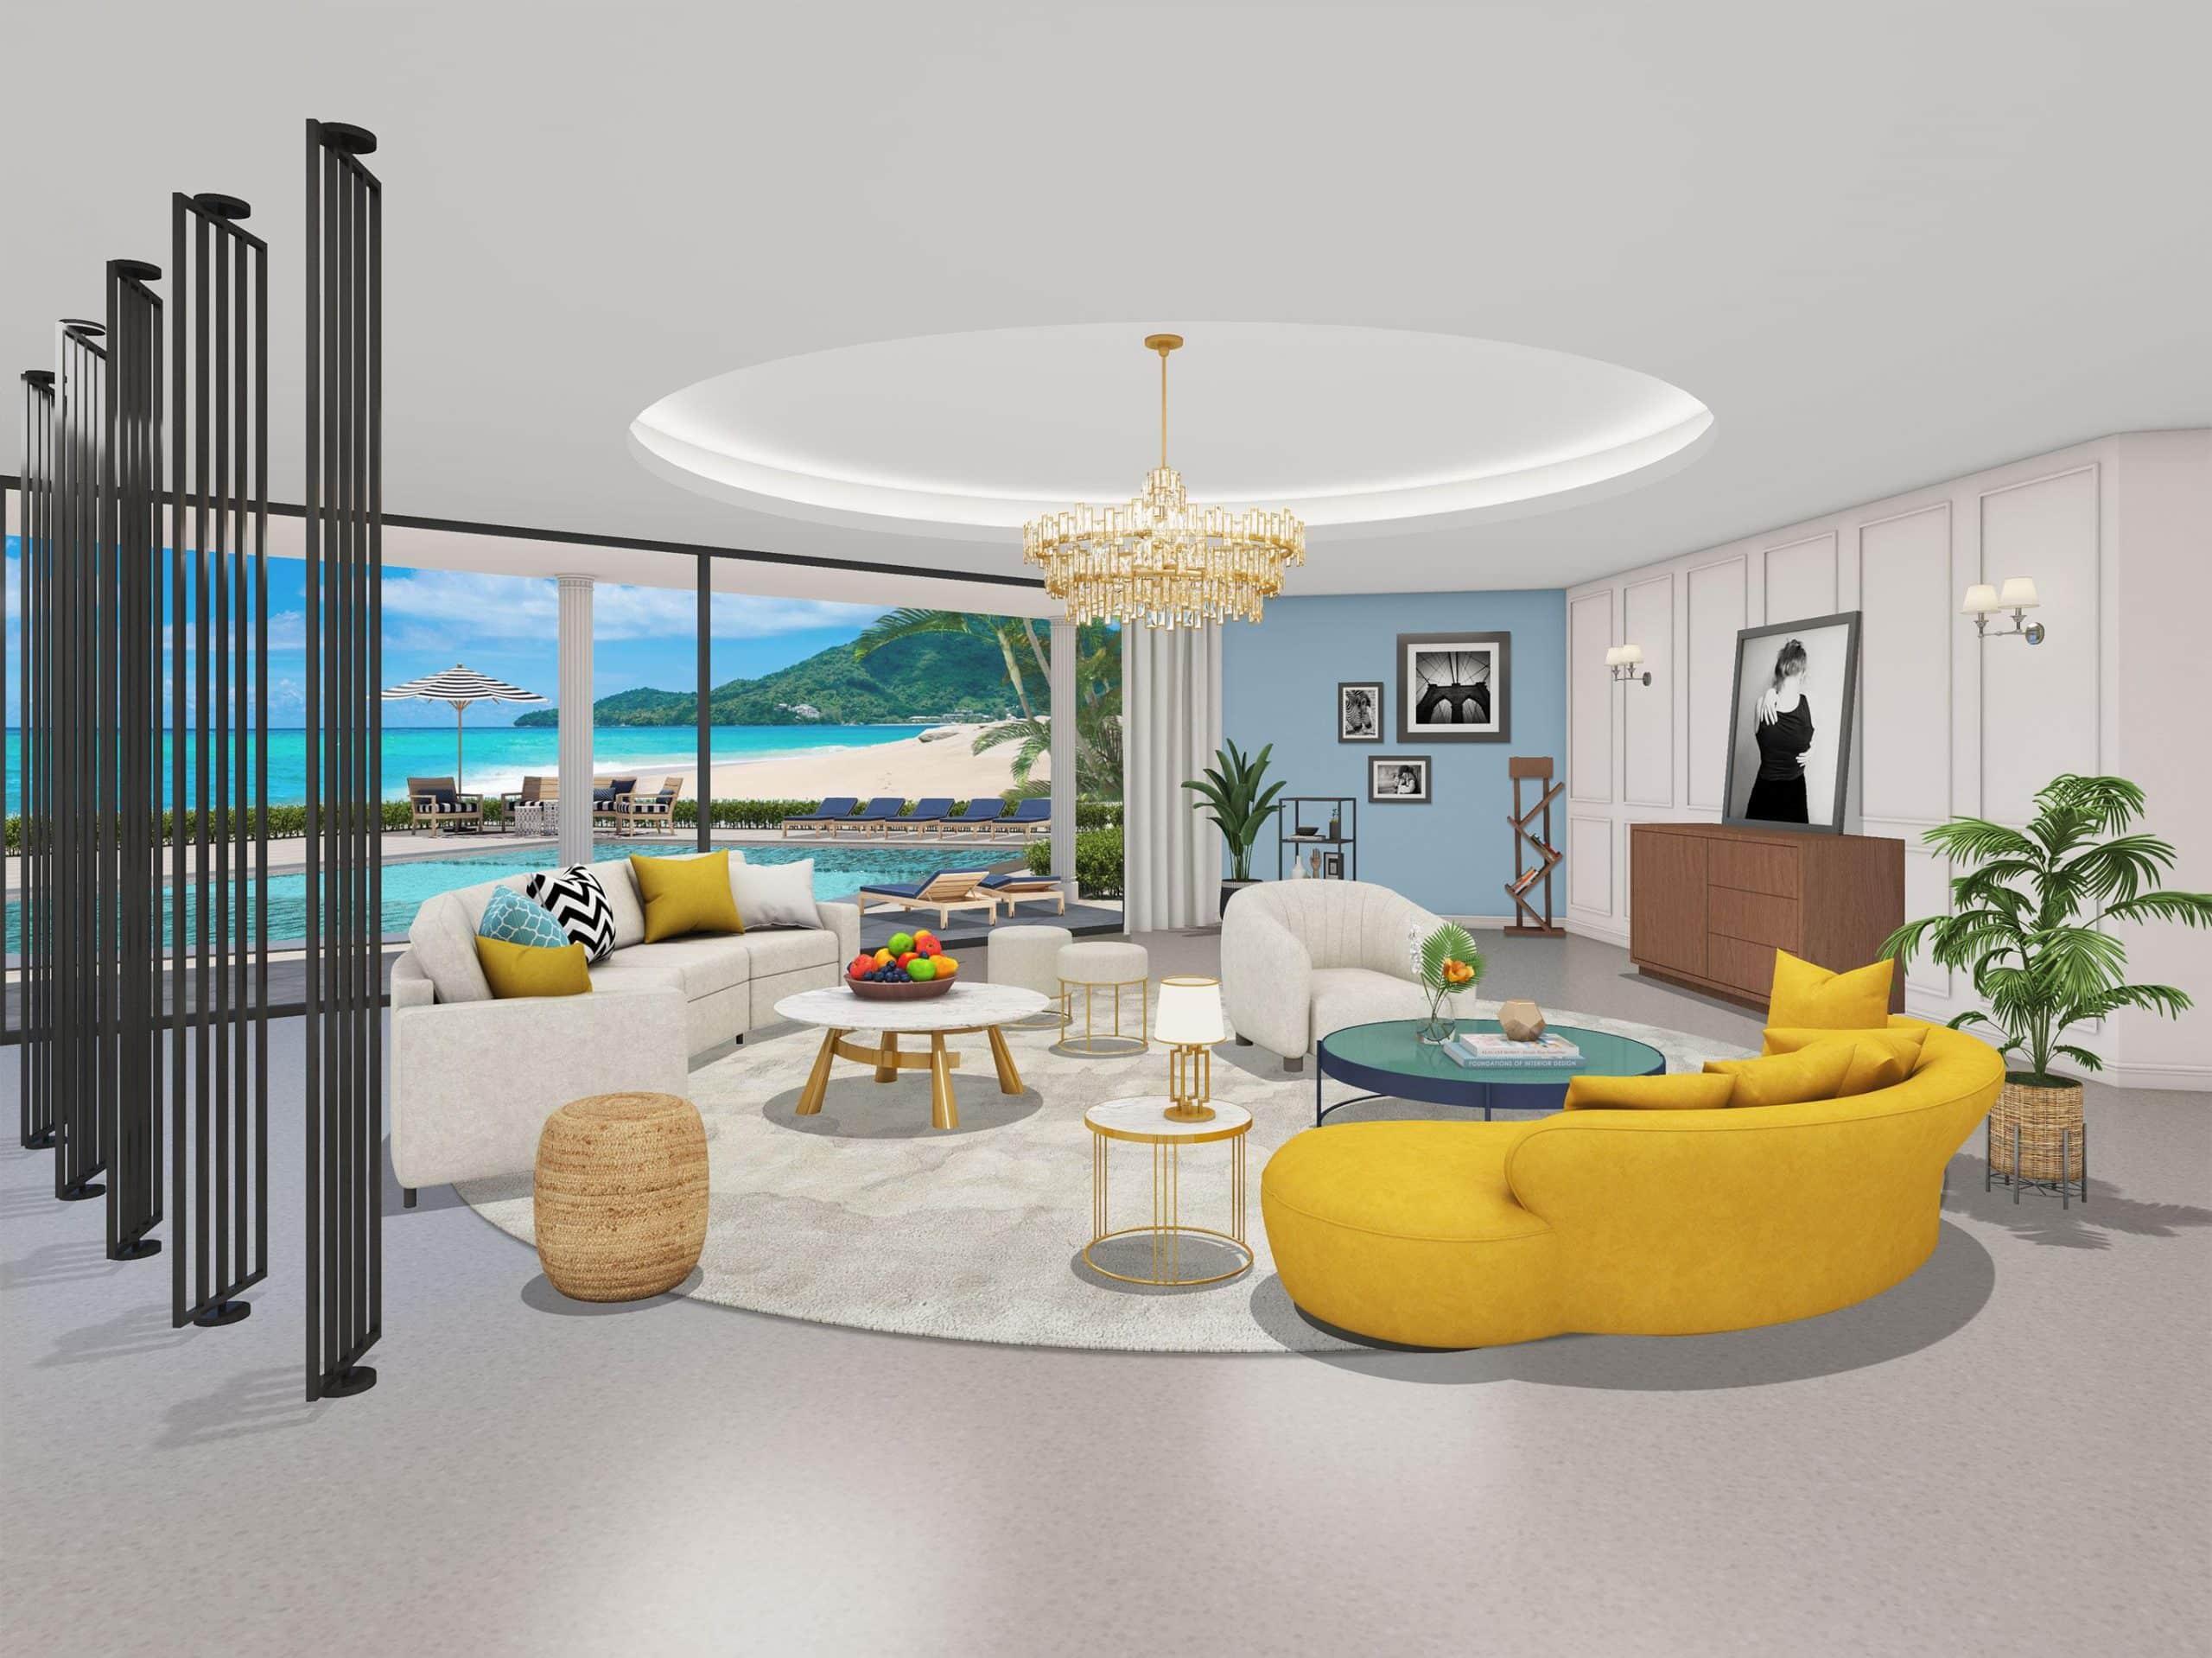 Home-Design-Hawaii-Life-scaled